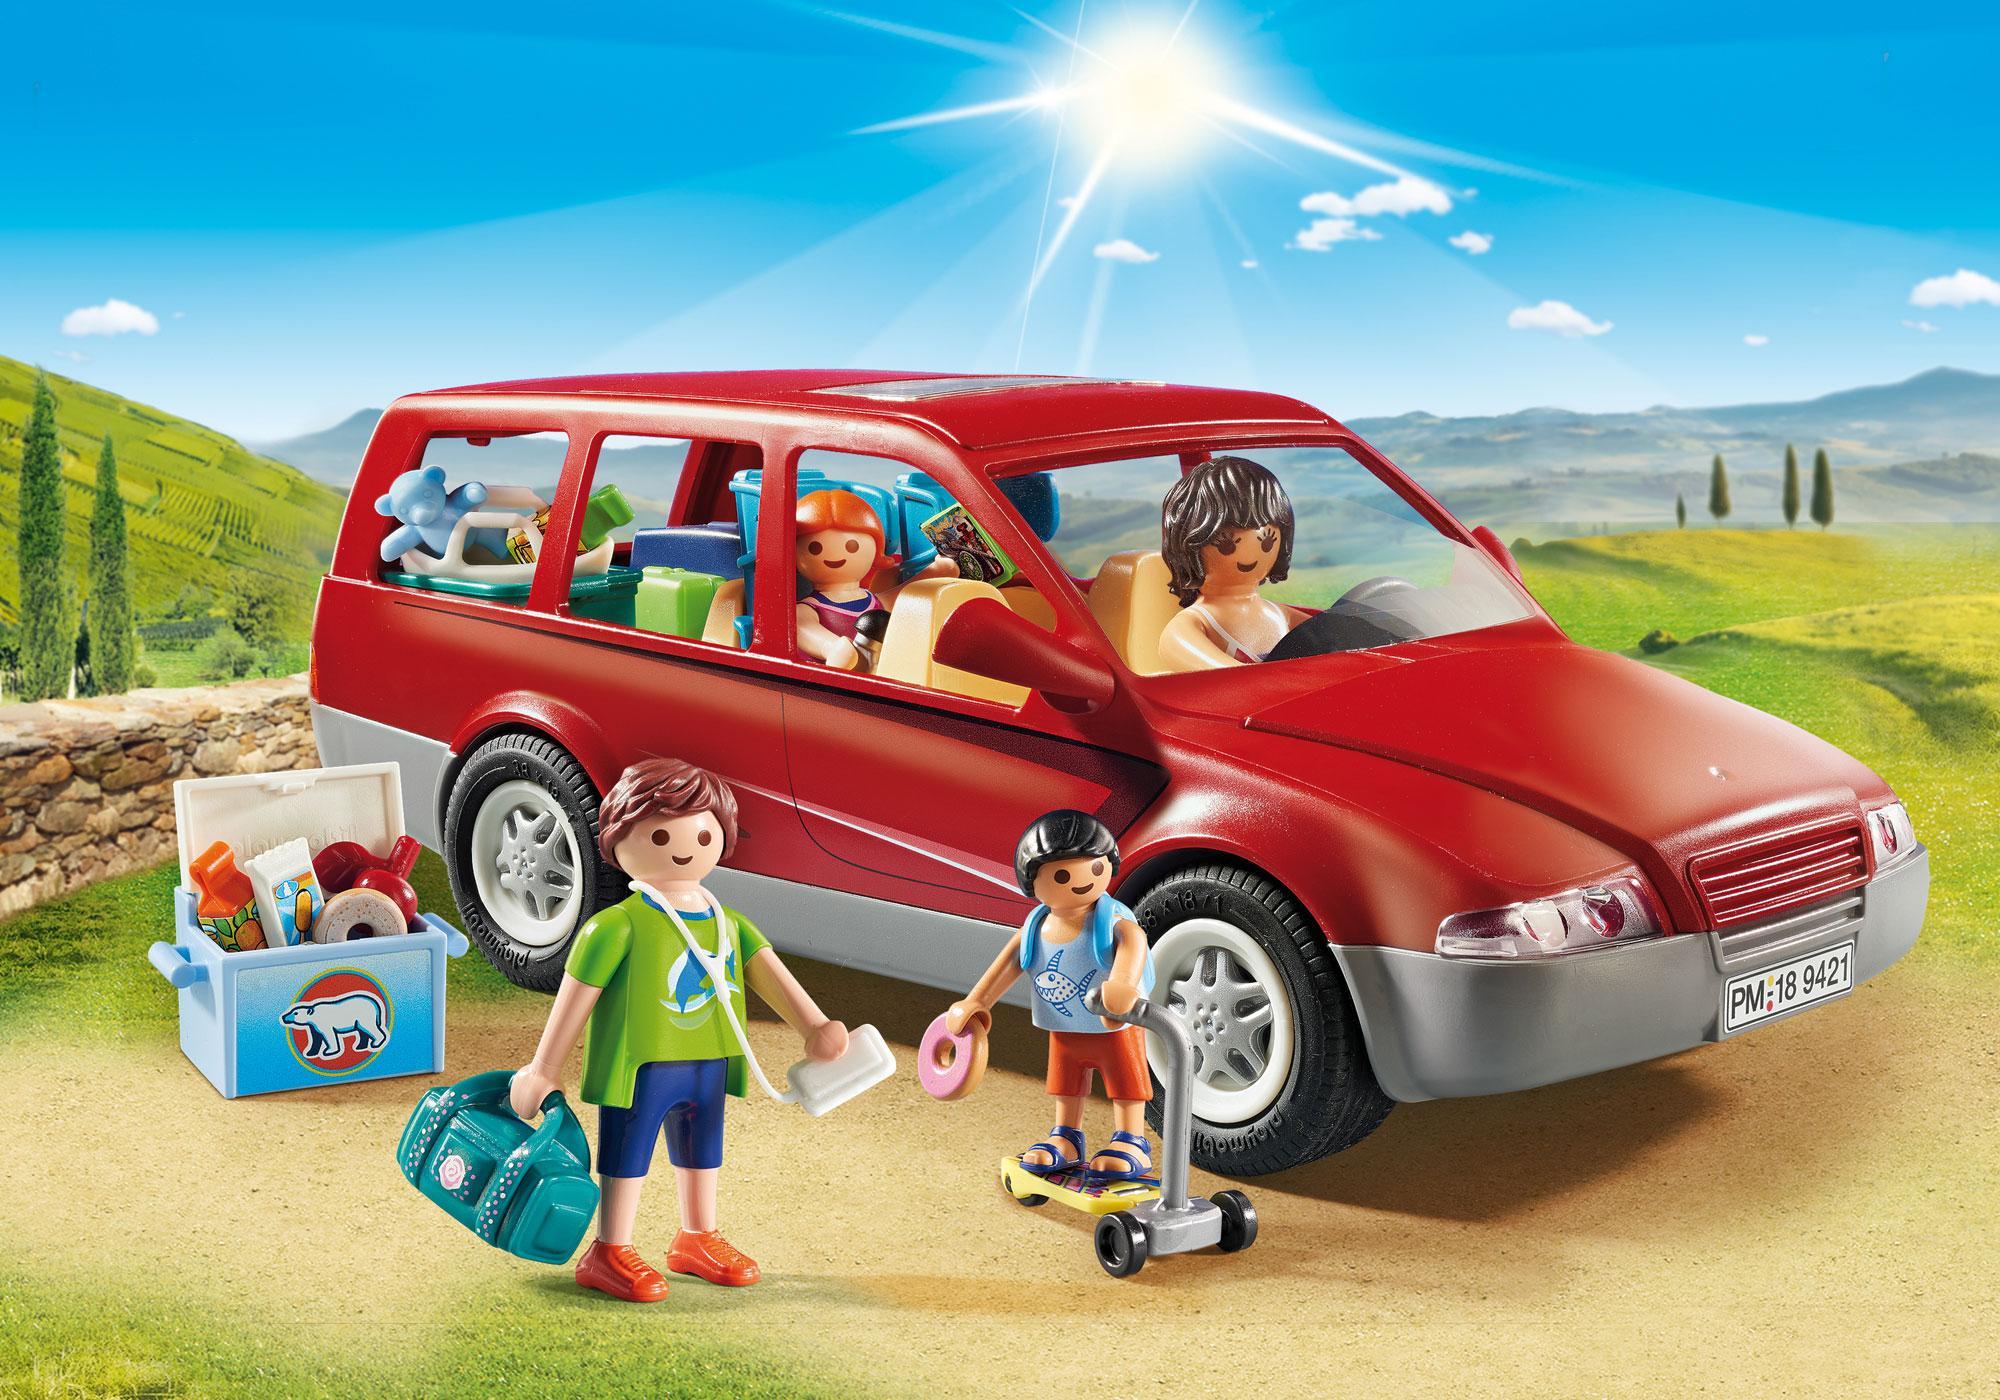 9421_product_detail/Οικογενειακό πολυχρηστικό όχημα